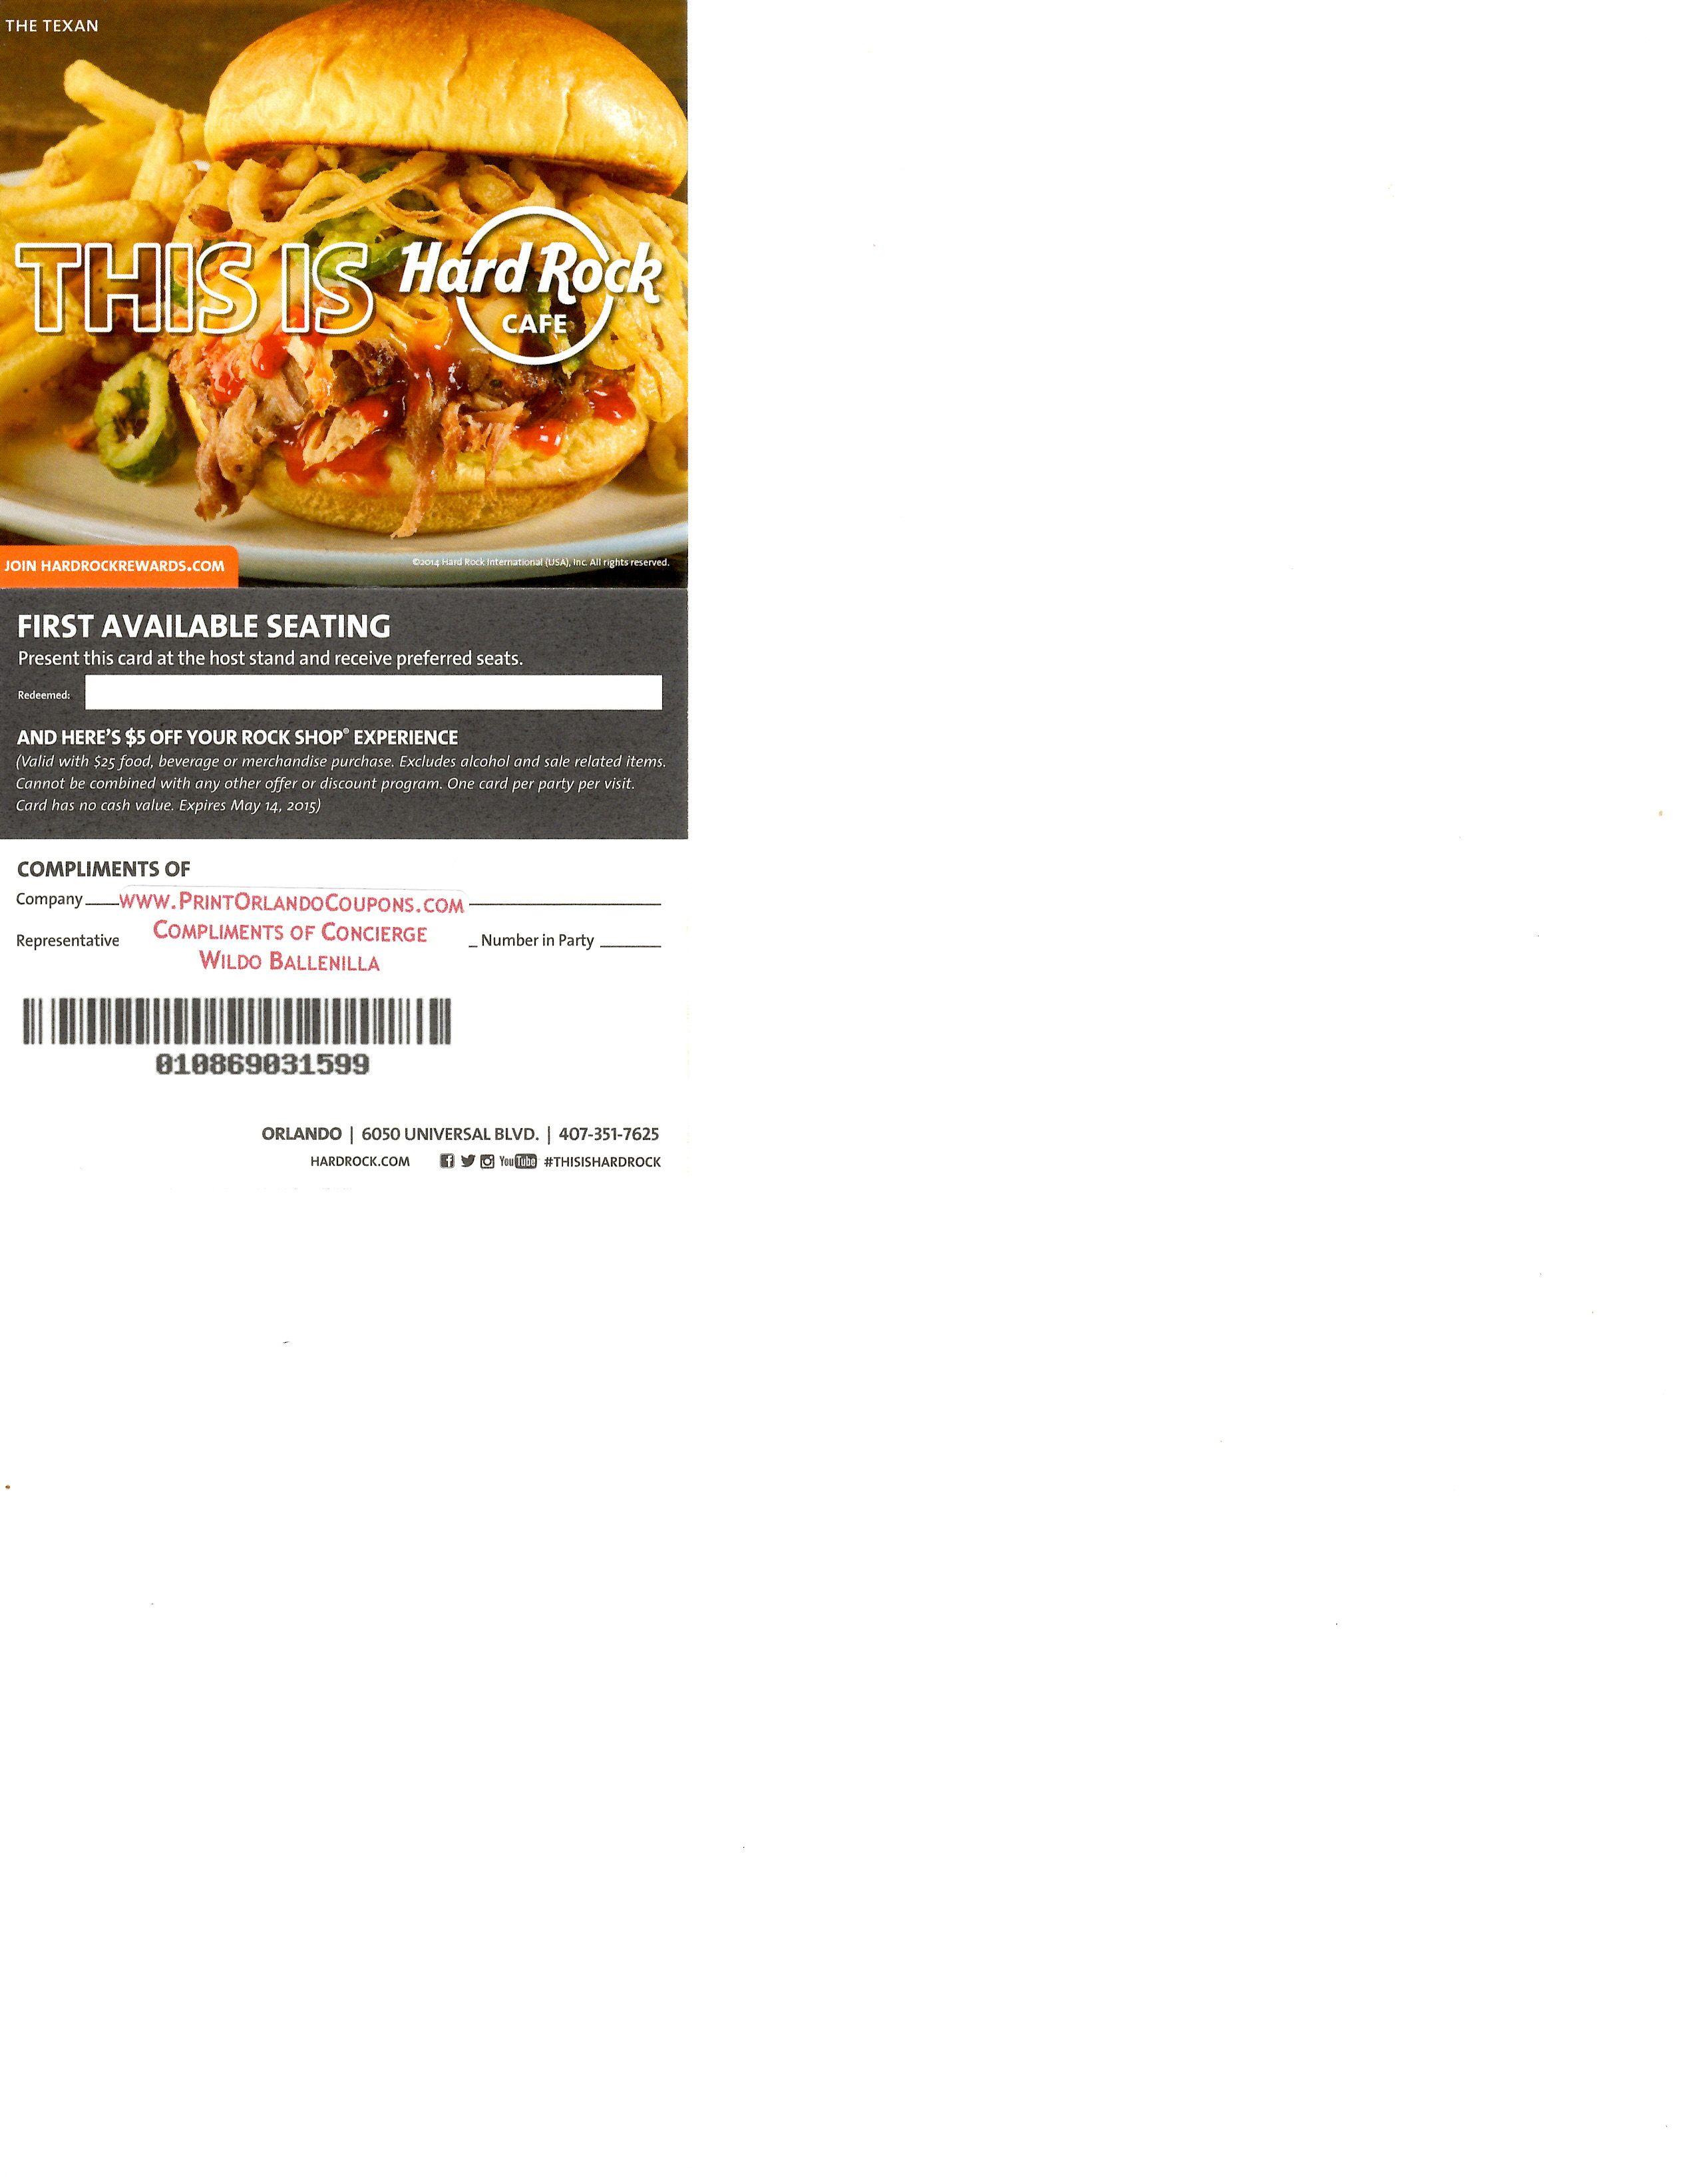 orlando food coupons